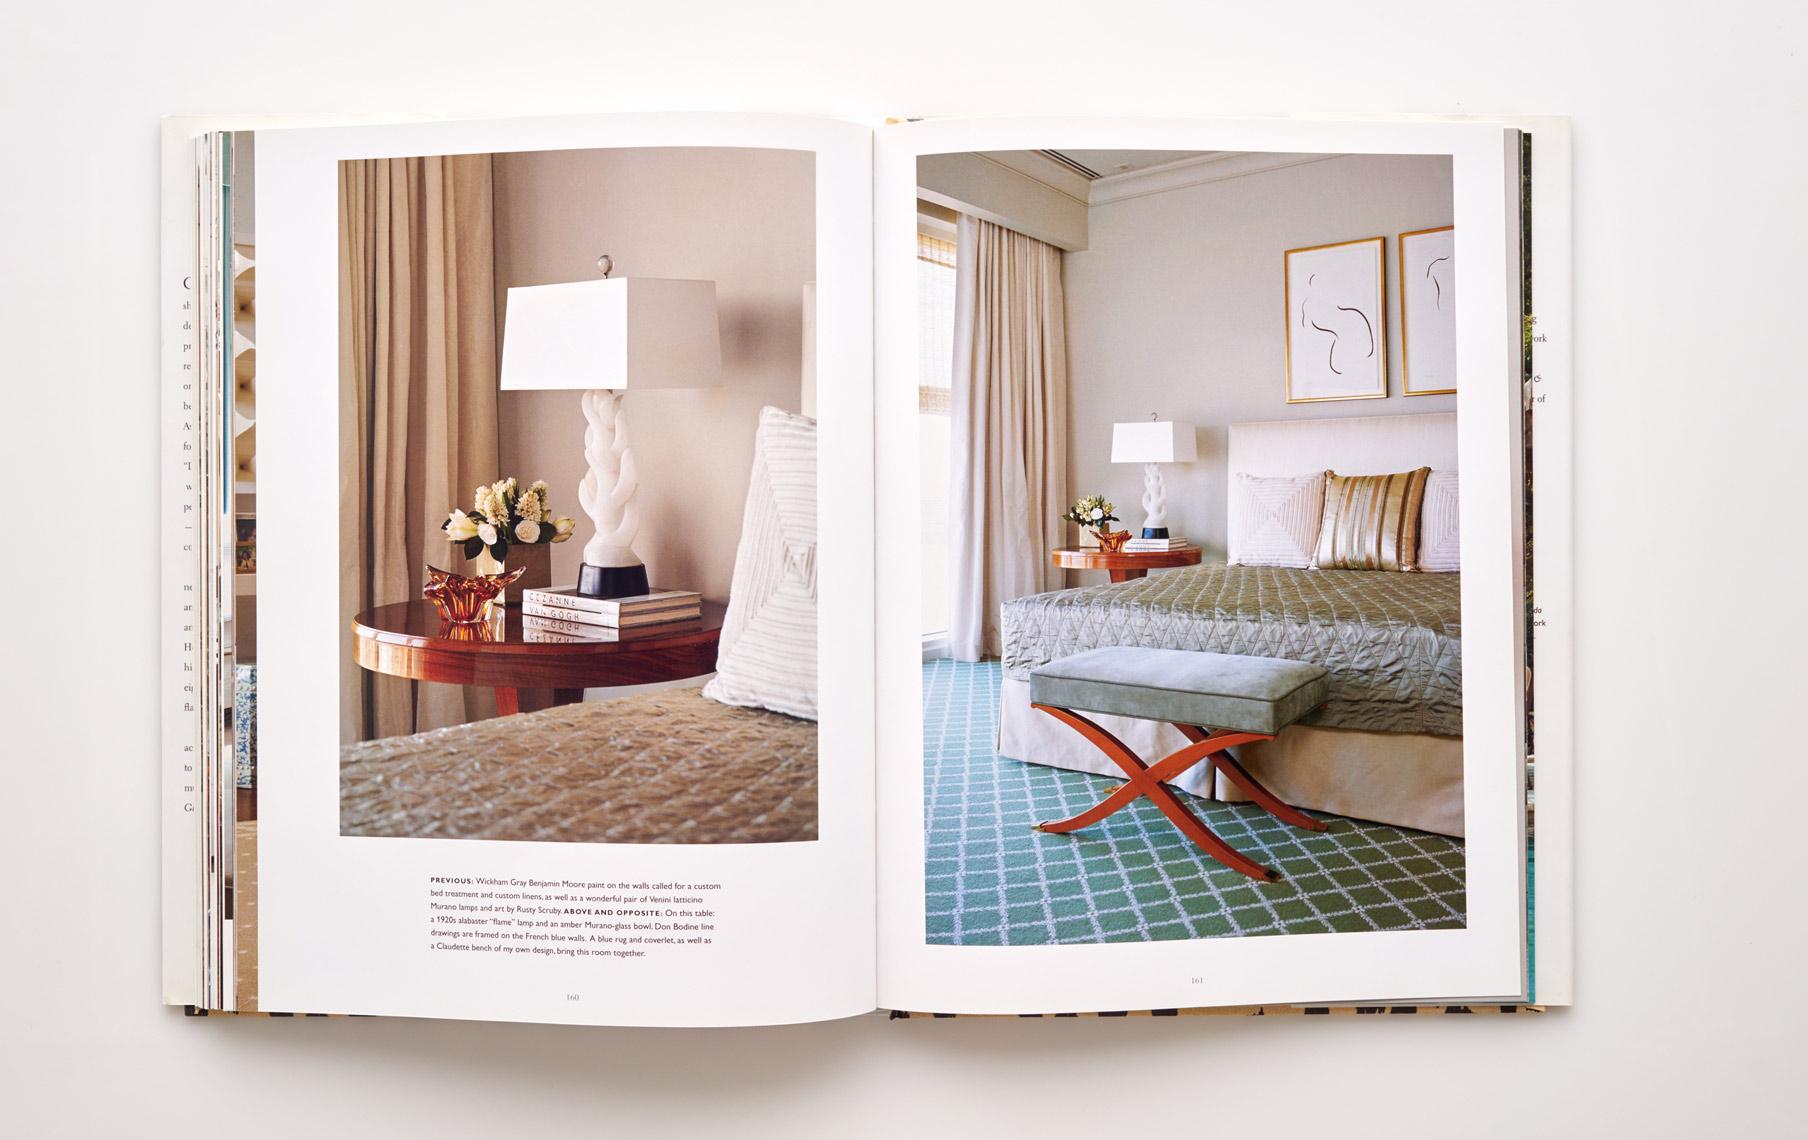 Stephen Karlisch Jan Showers Glamorous Rooms Bedroom Accents